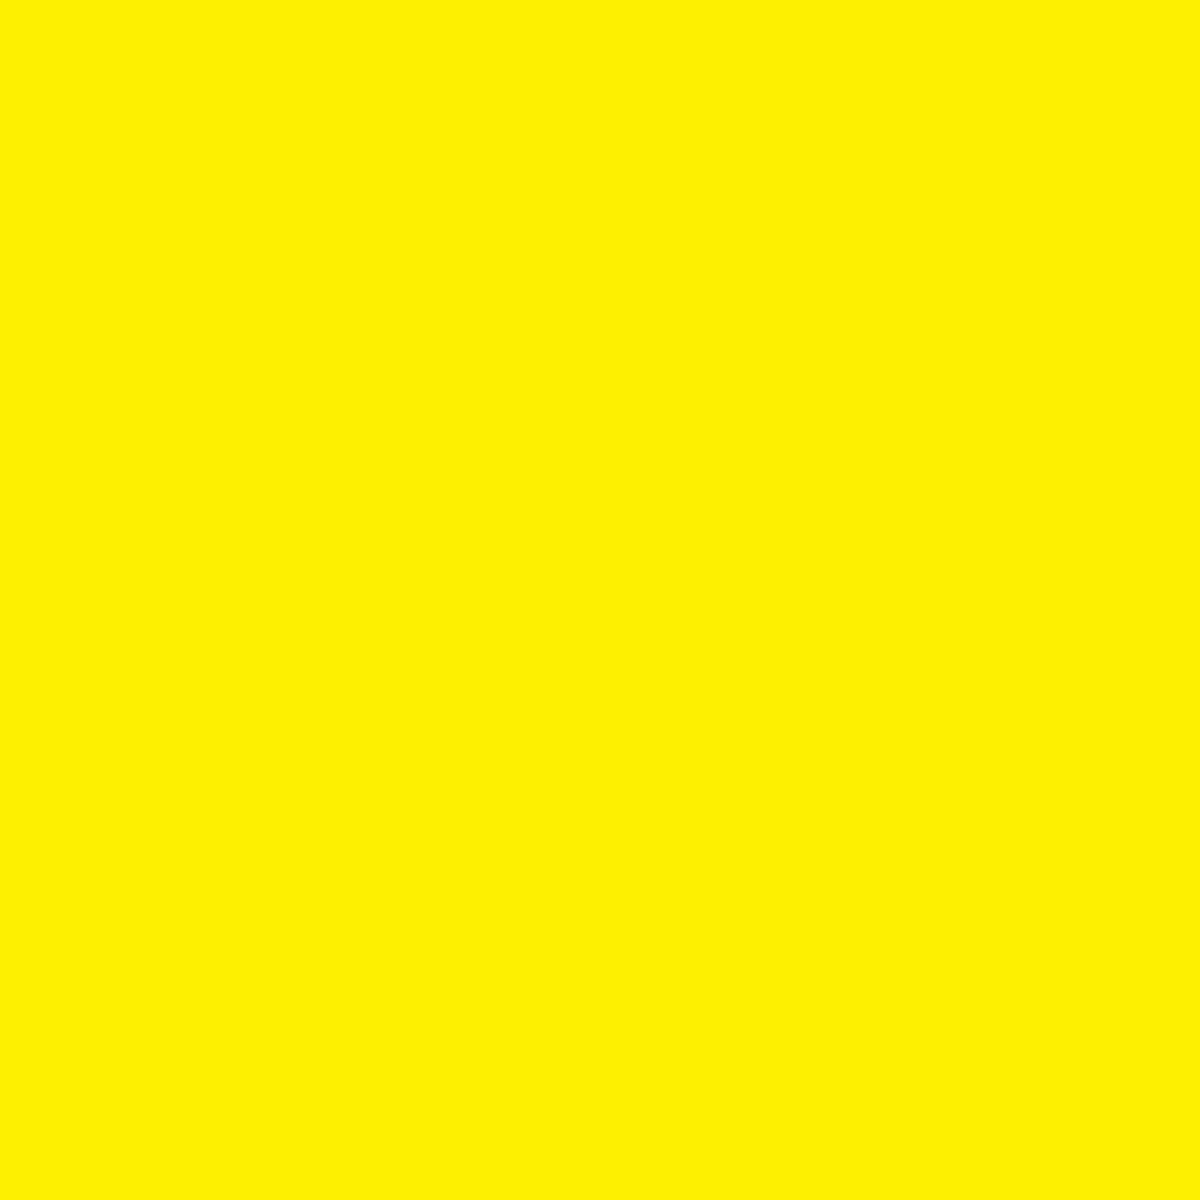 Gaumar - Yellow